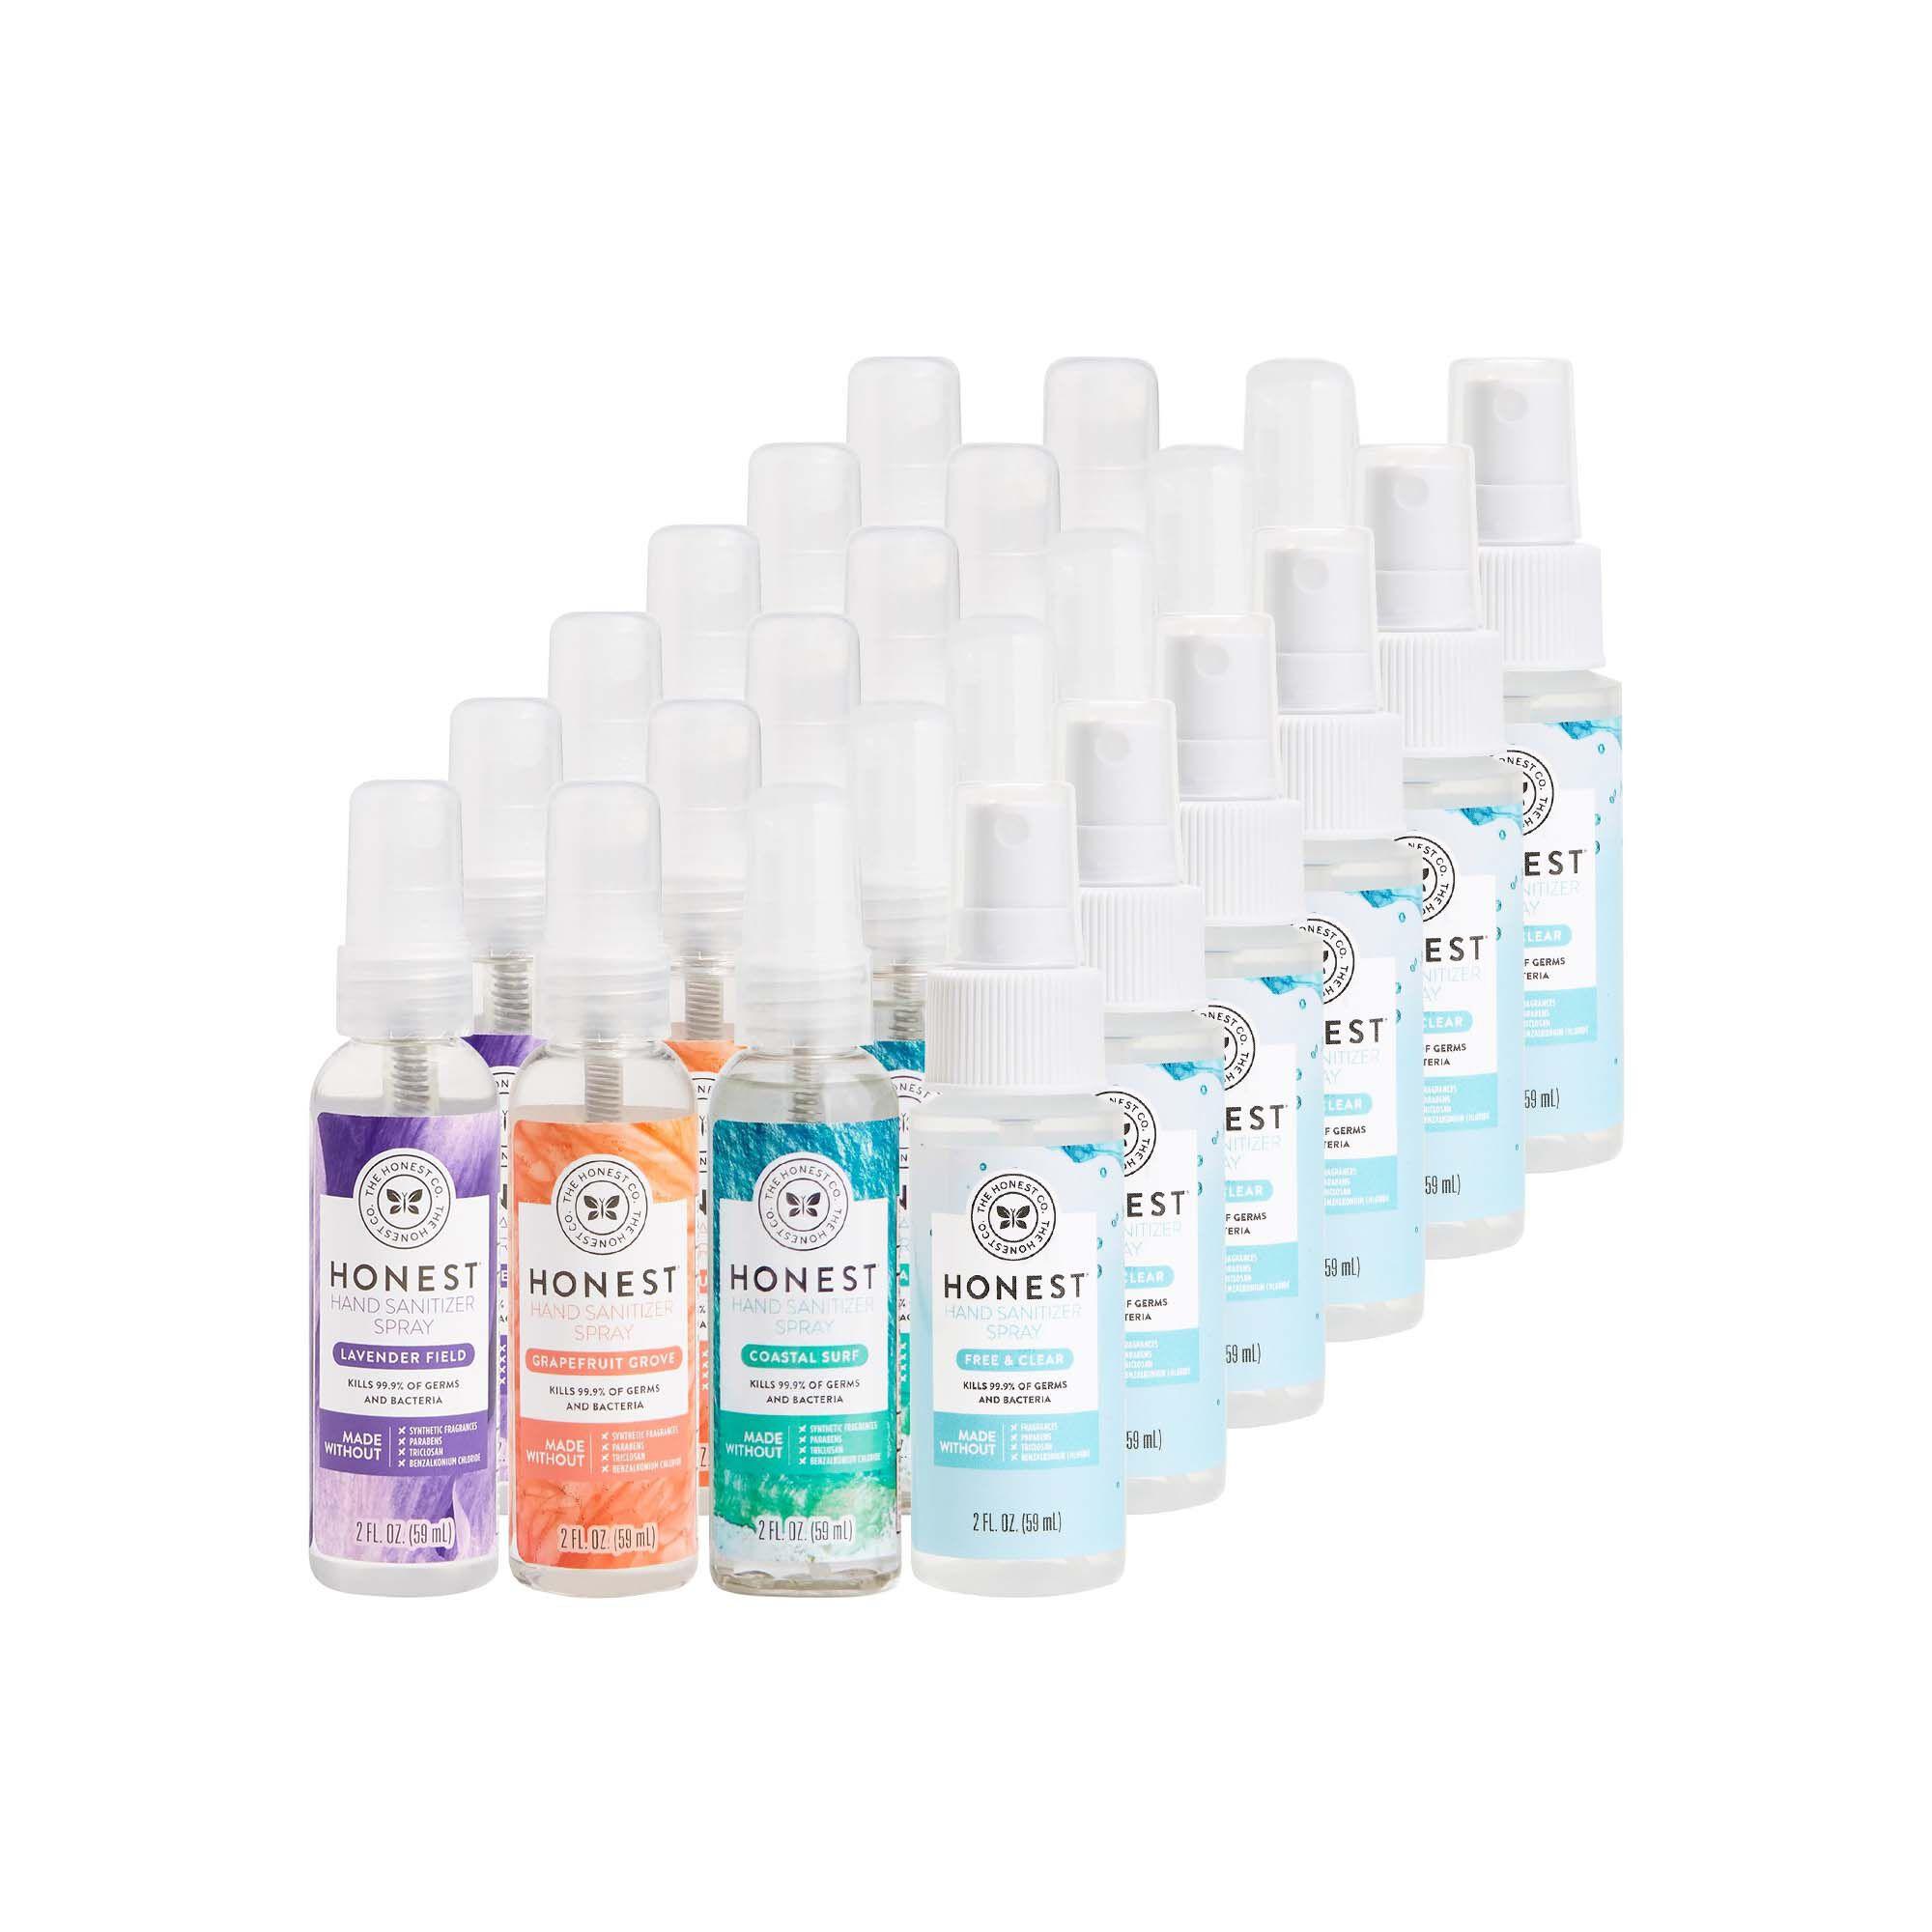 Hand Sanitizer Spray, Multi-Scent, 24-Pack